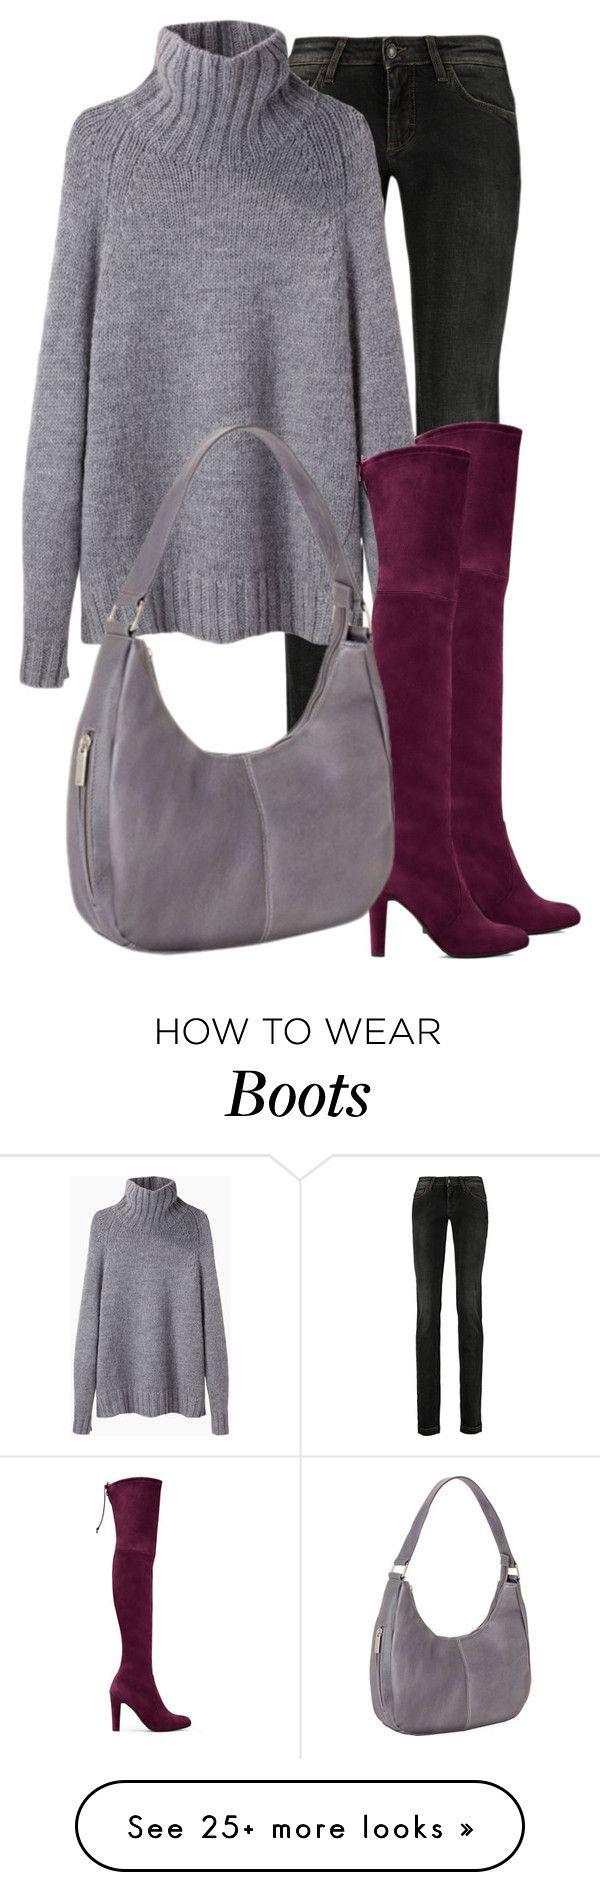 """oxblood boots"" by jana-zed on Polyvore featuring Dolce&Gabbana, Stuart Weitzman, La Garçonne Moderne, Le Donne, StuartWeitzman and lagarconne"